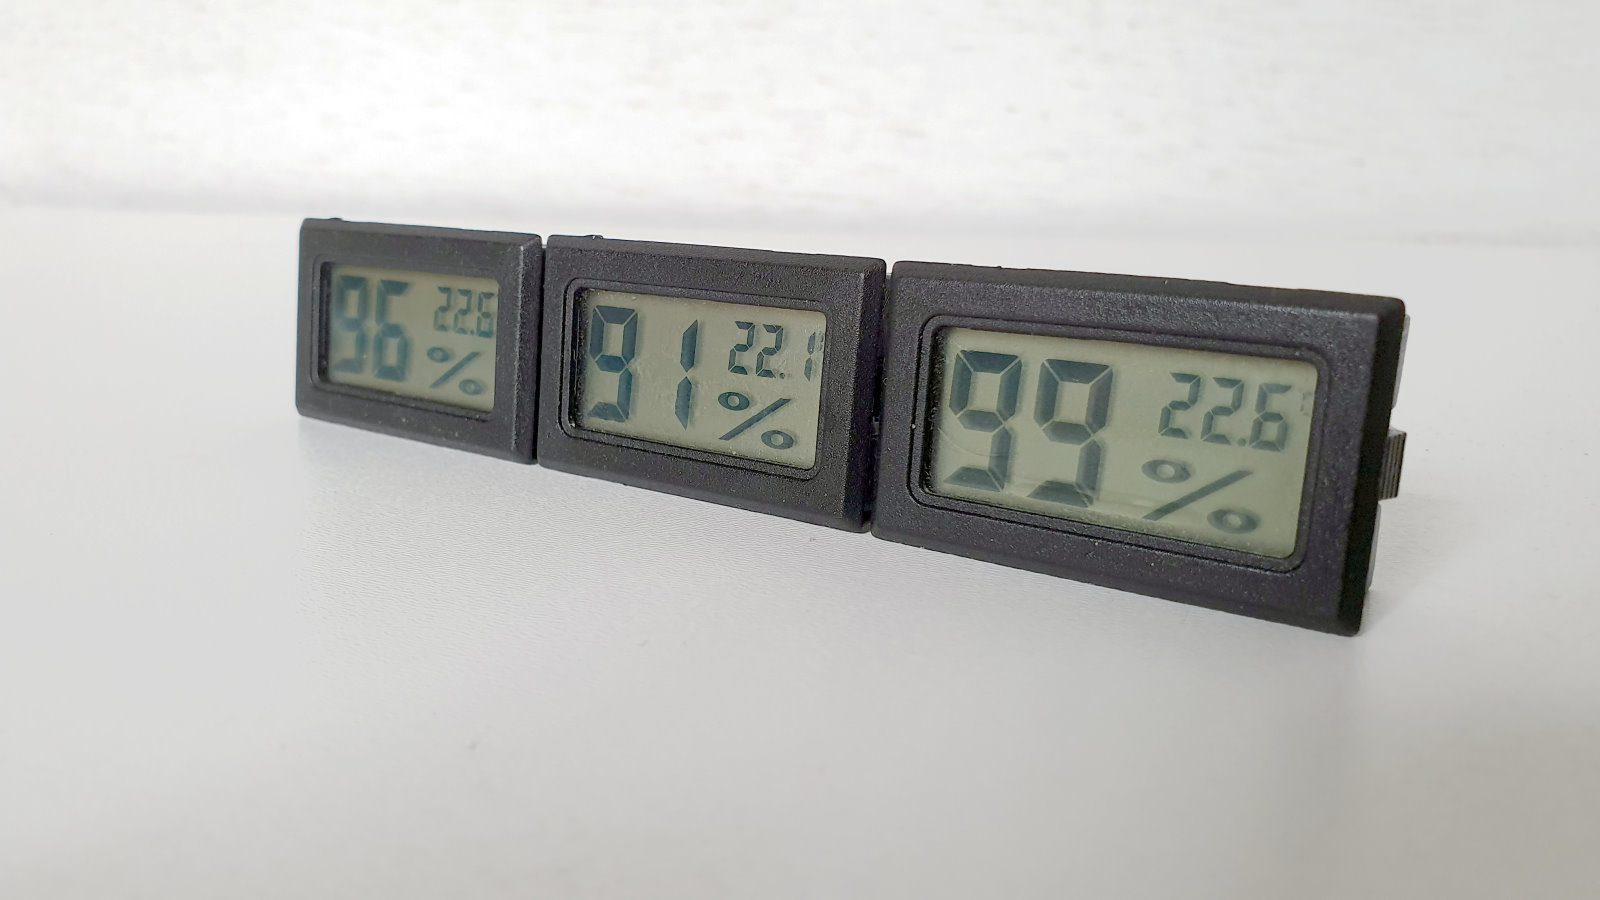 Mini LCD Digital Hygrometer Thermometer von EEEKit